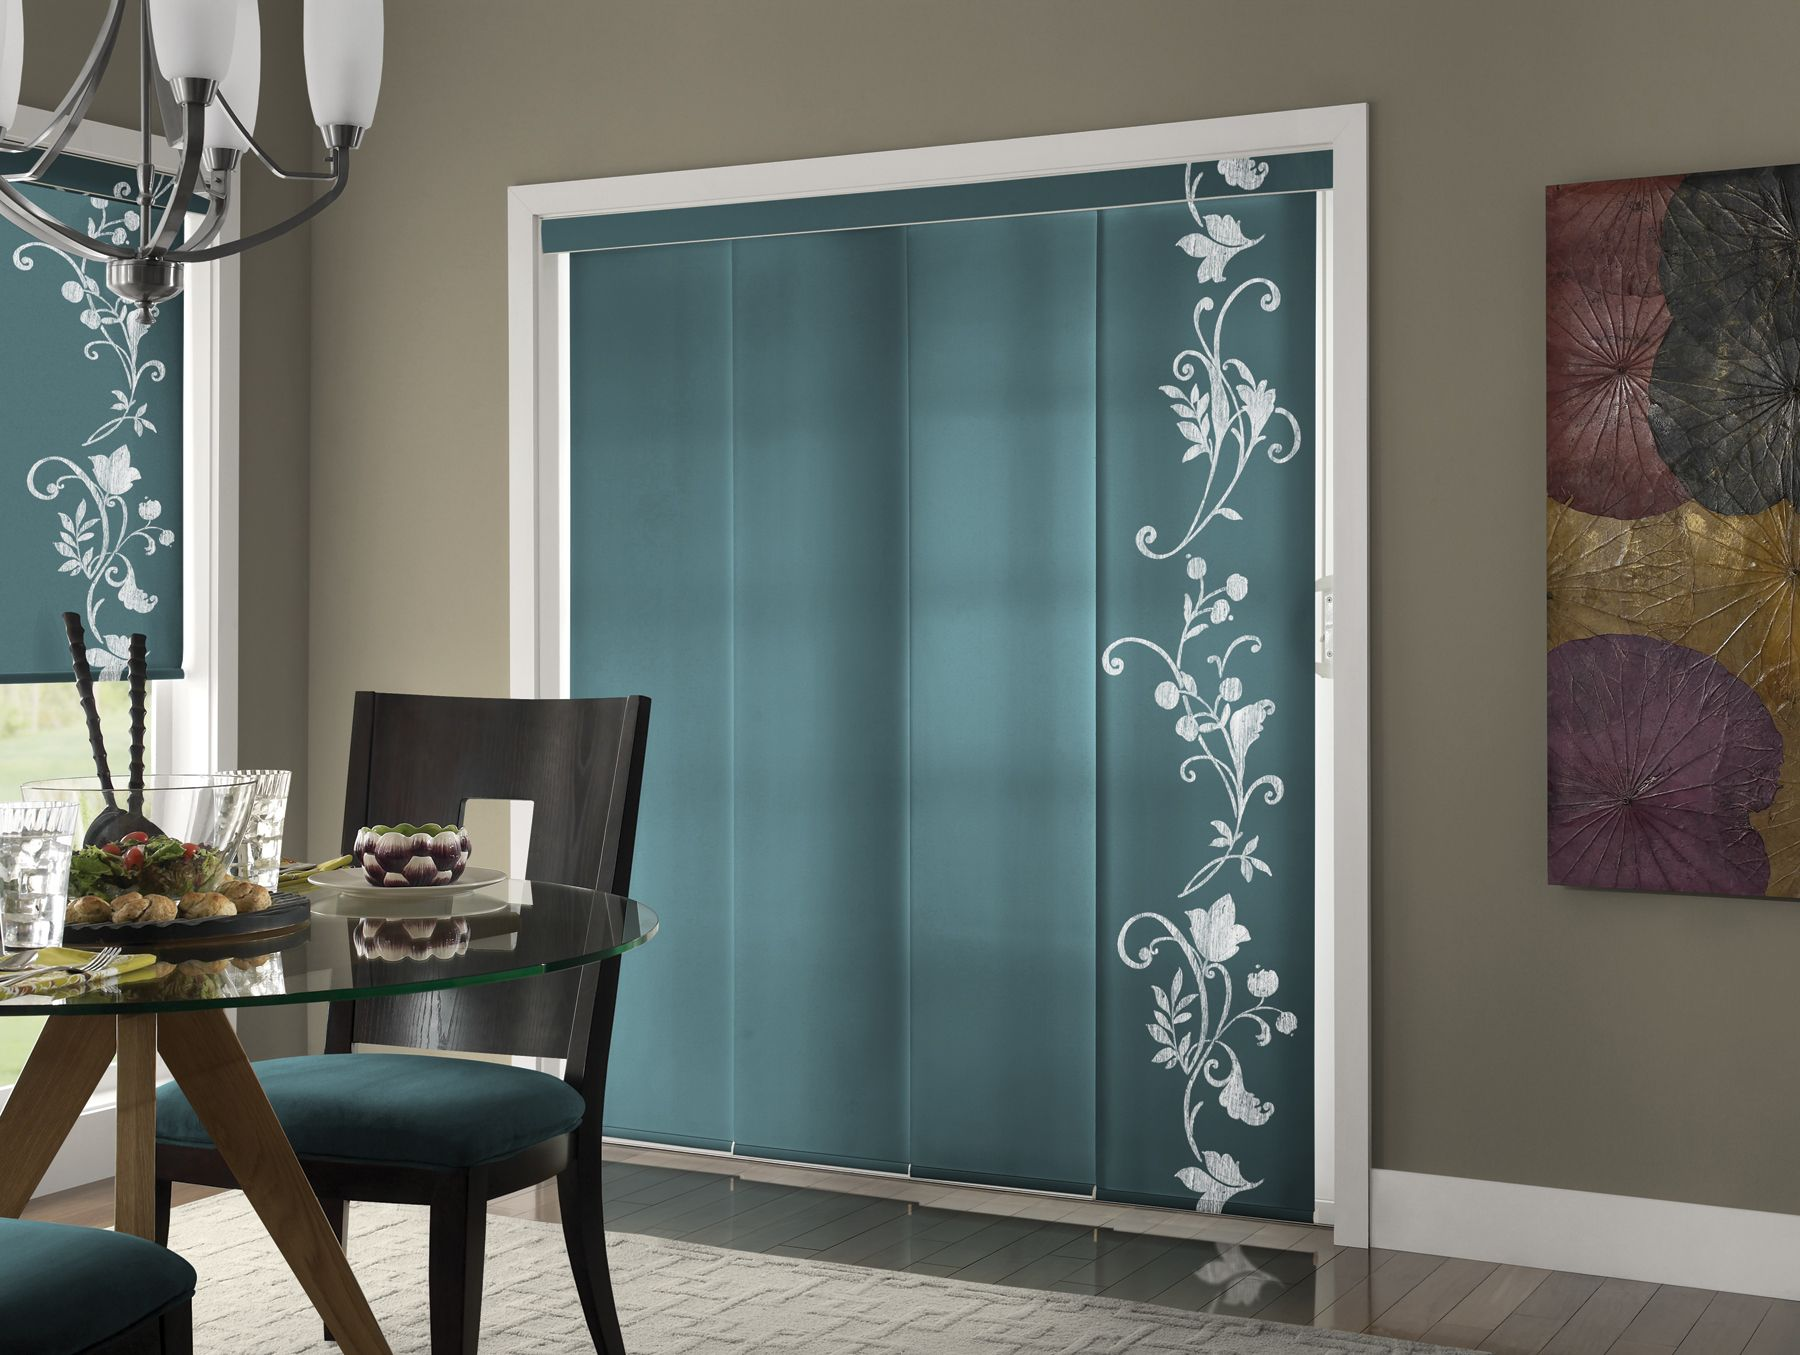 Fancy Window Coverings For Sliding Glass Doors Design